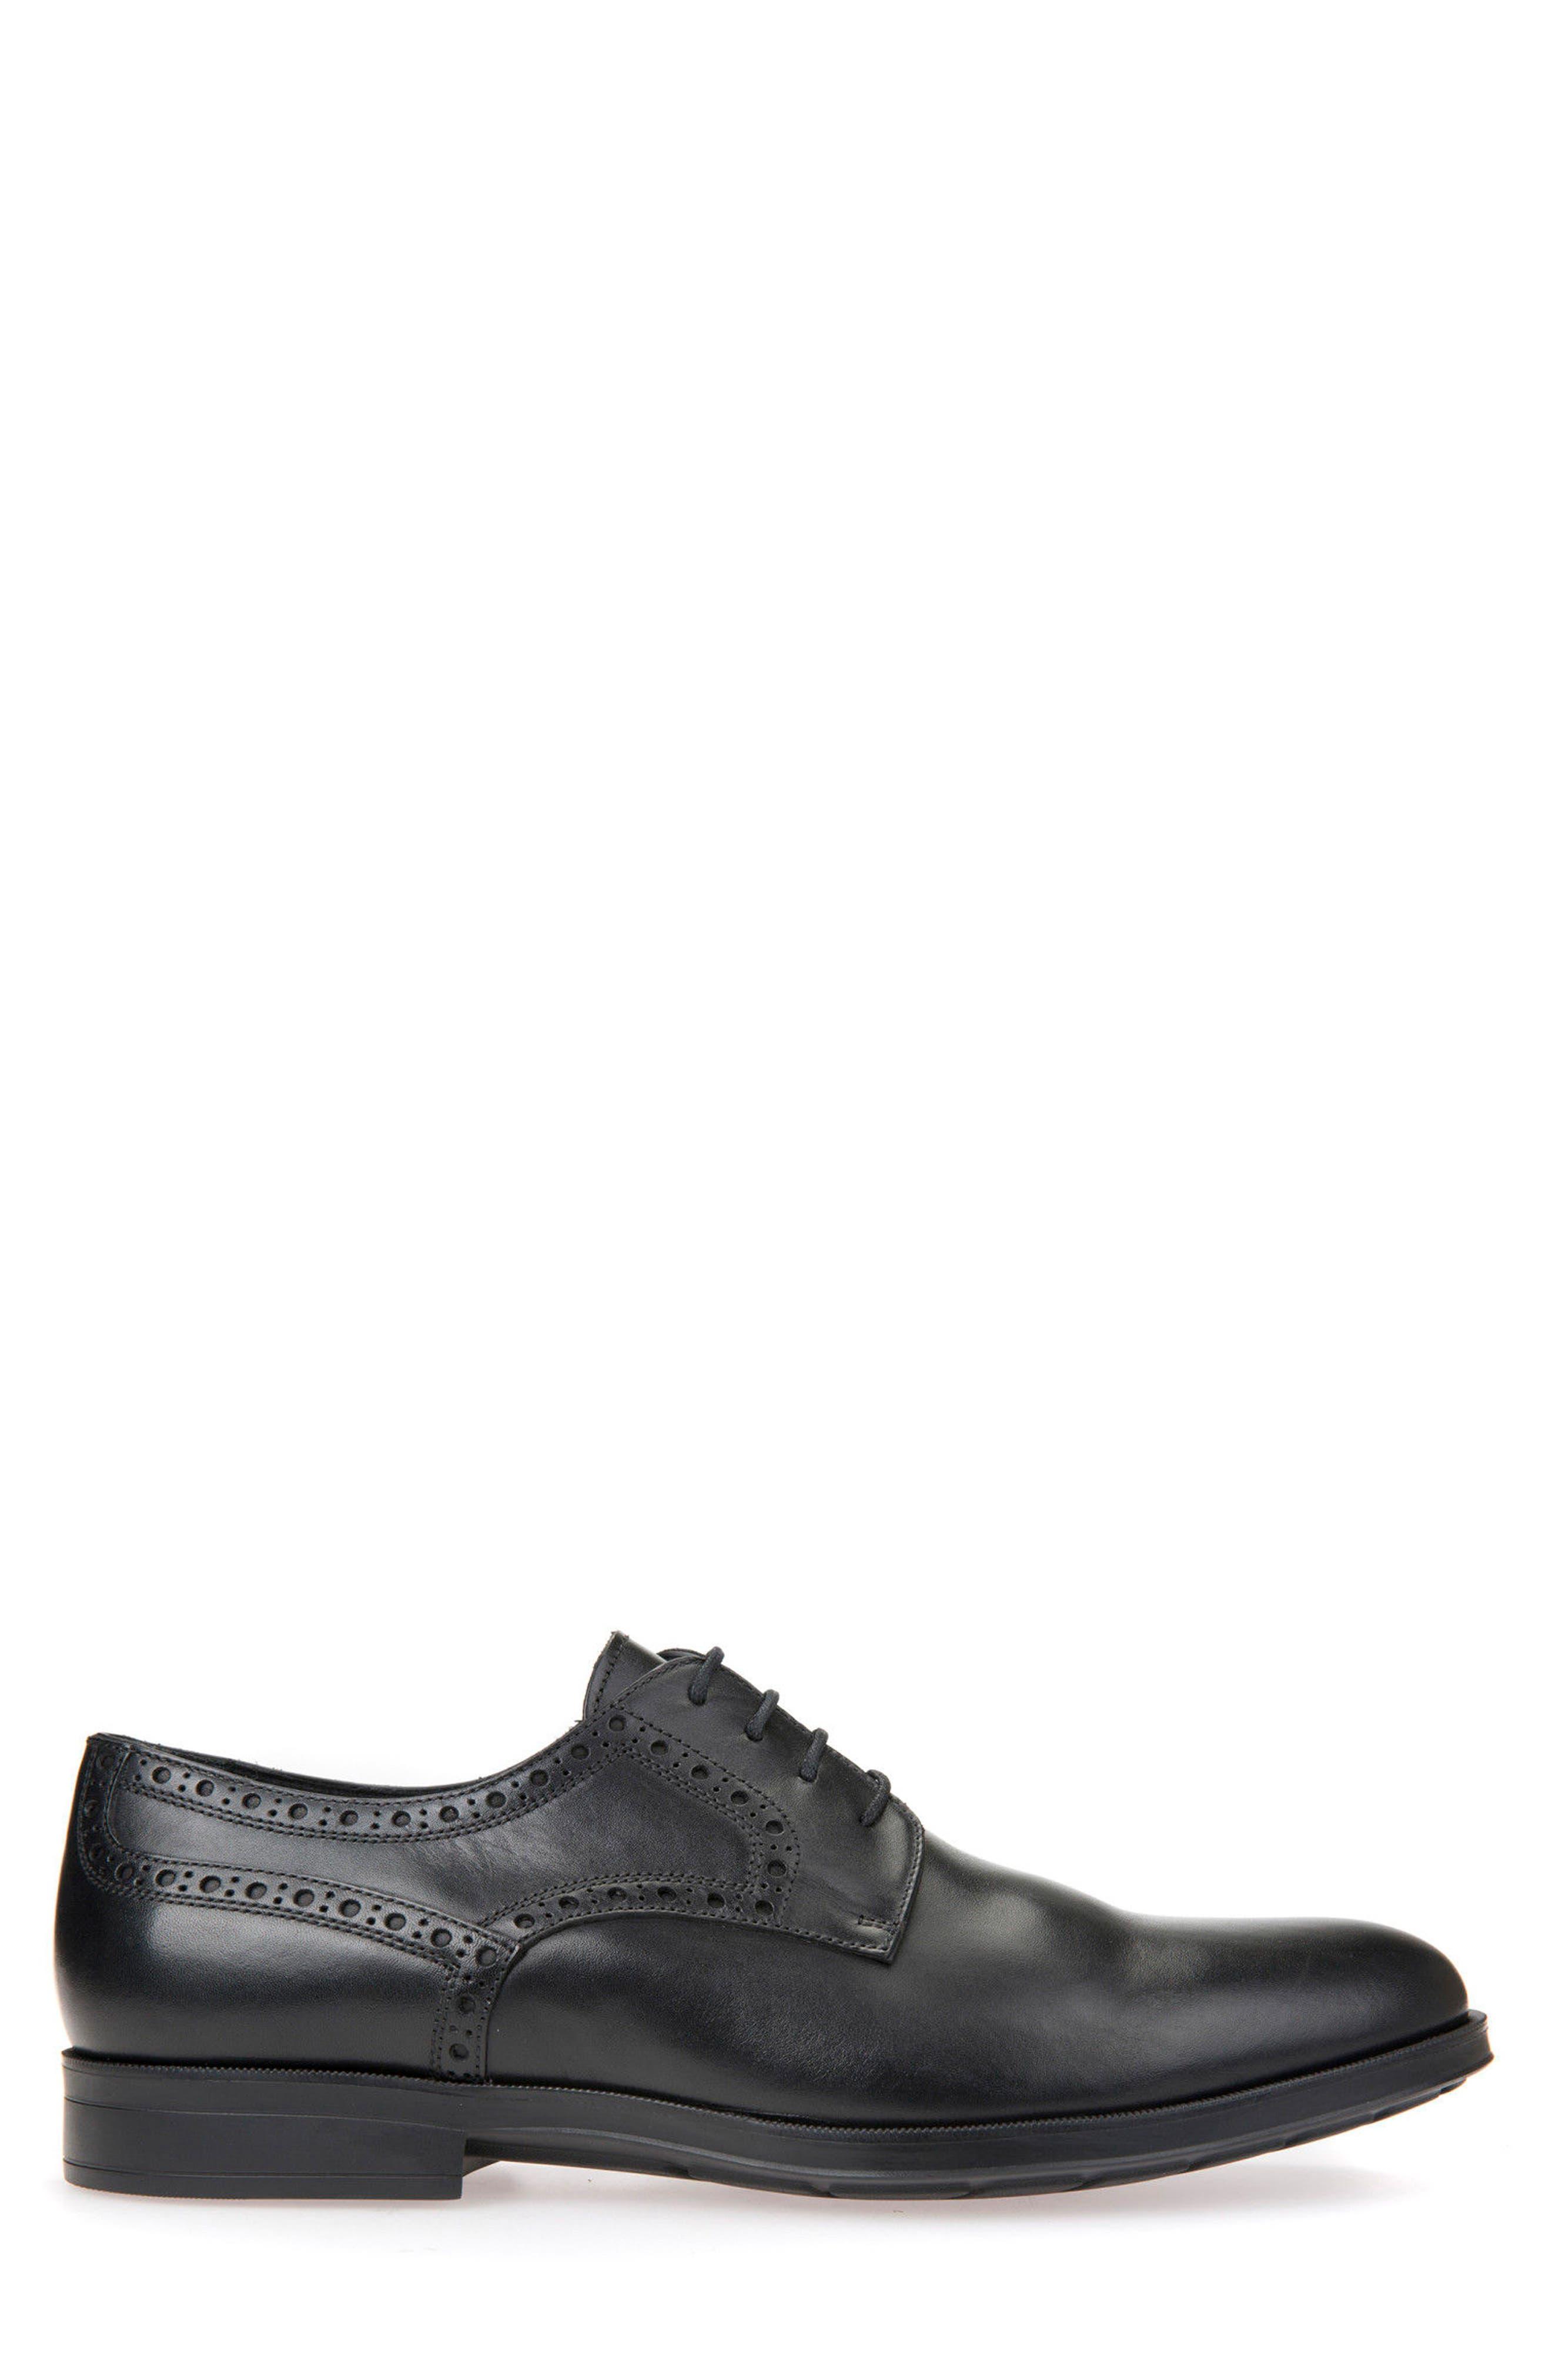 GEOX, Hilstone 3 Plain Toe Derby, Alternate thumbnail 3, color, BLACK LEATHER